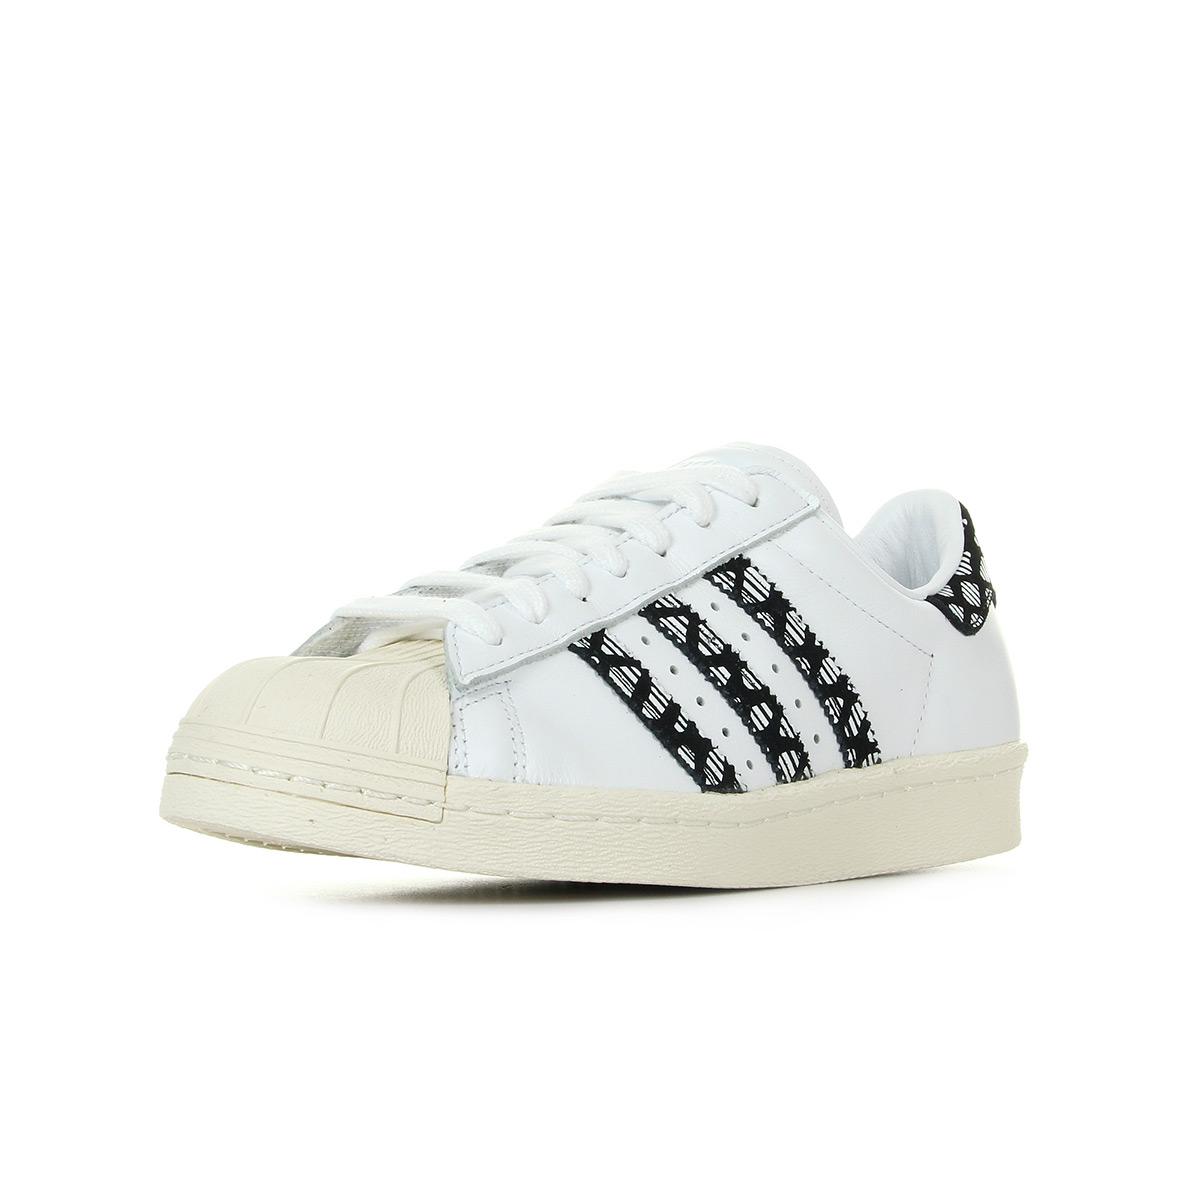 adidas Superstar 80S BY9074 b77161d9788